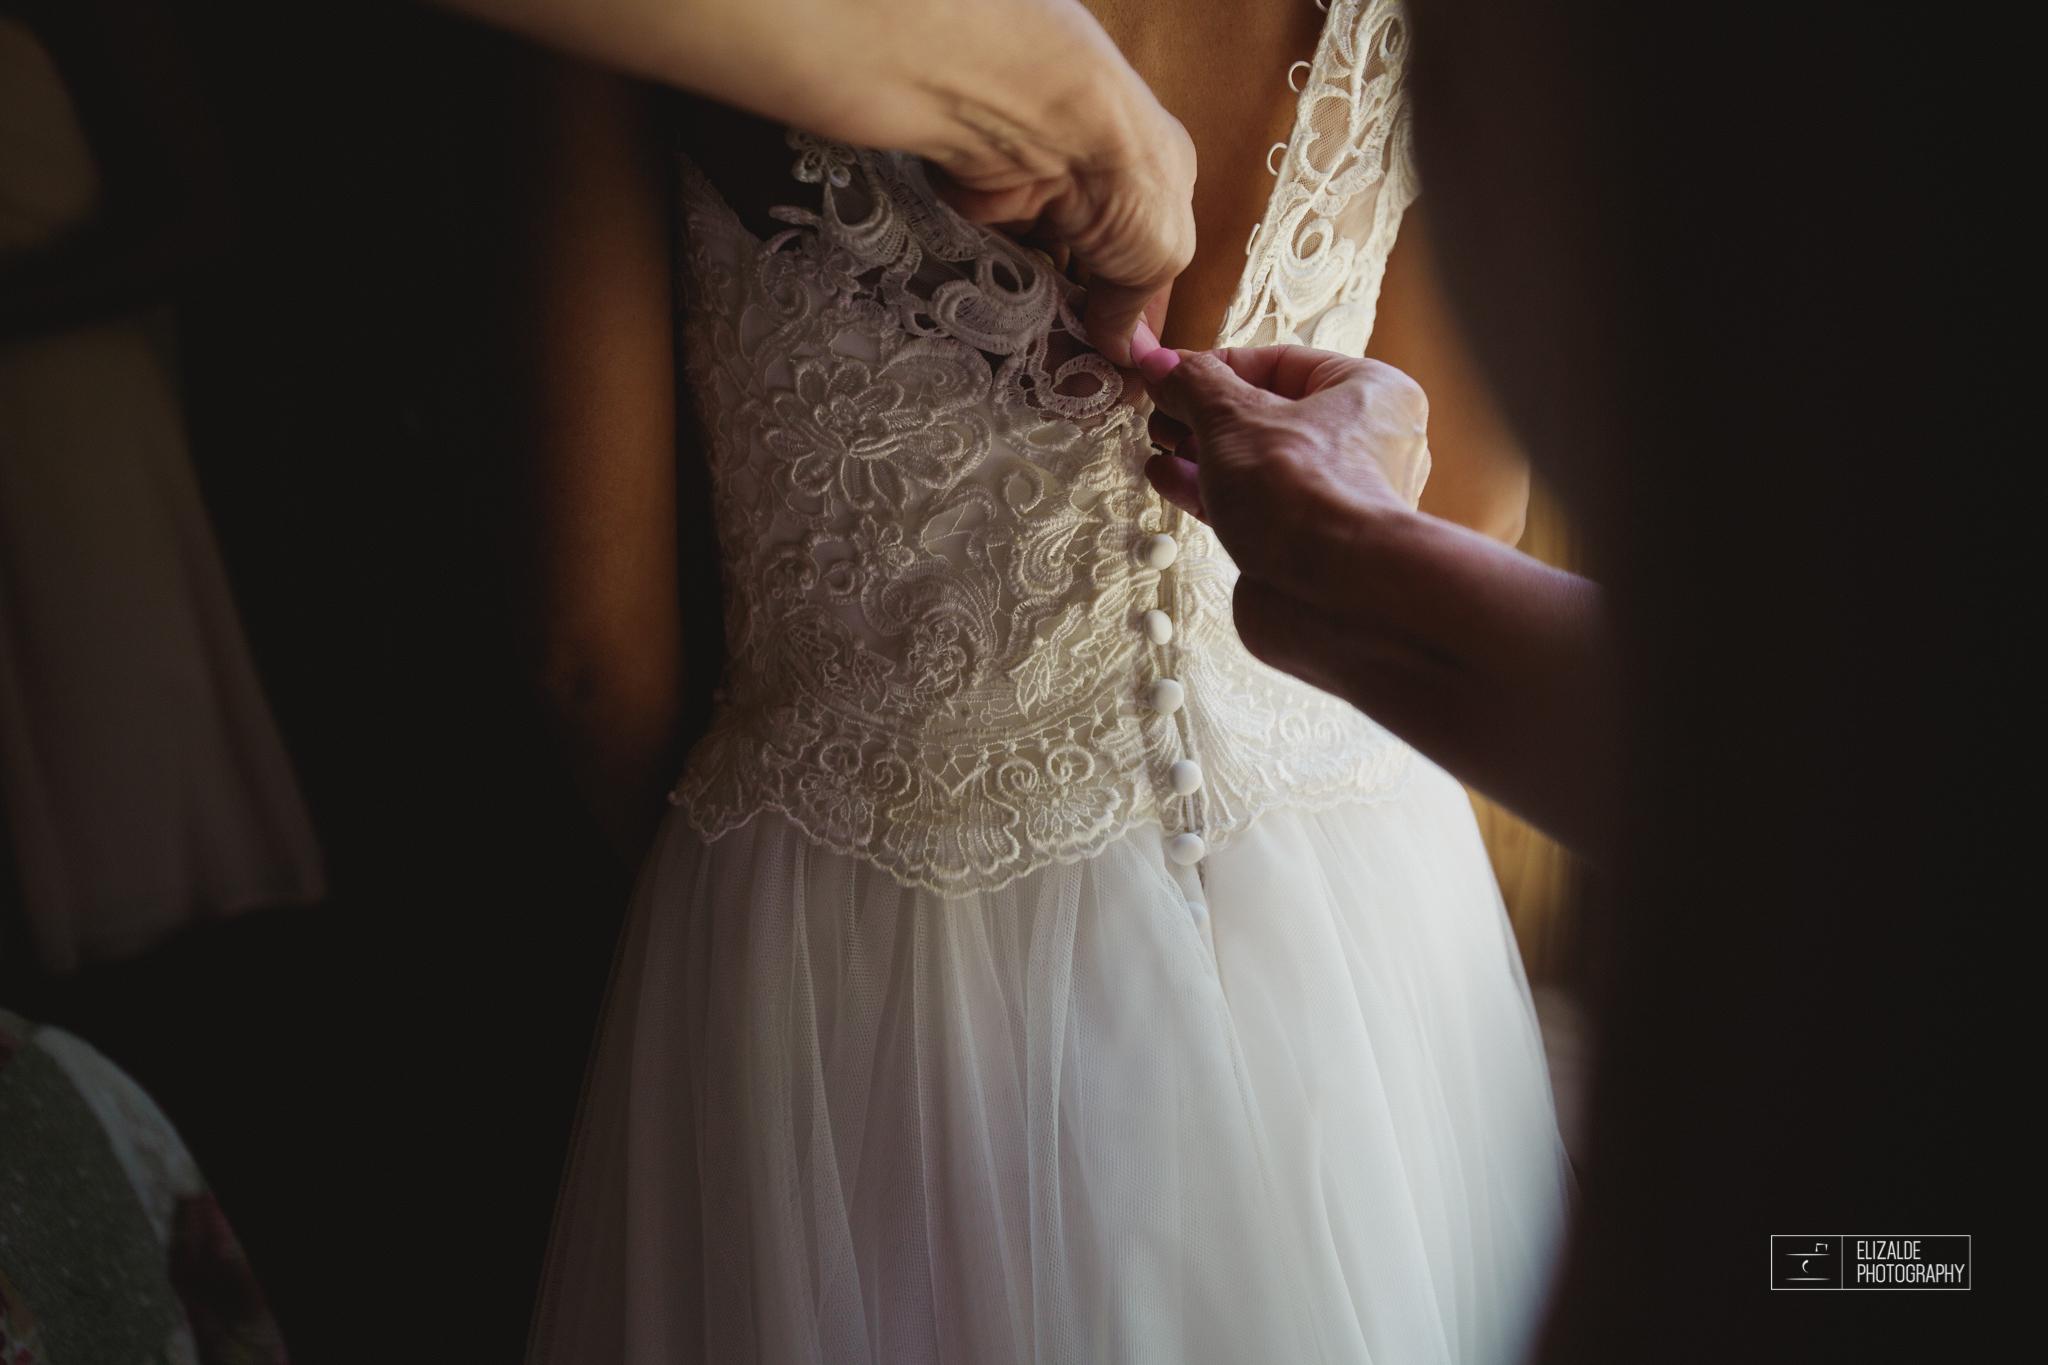 Wedding photographer Dallas_Elizalde Photography_DFW Wedding photographer_ Hickoty Hills_Wedding Photography (19 of 90).jpg